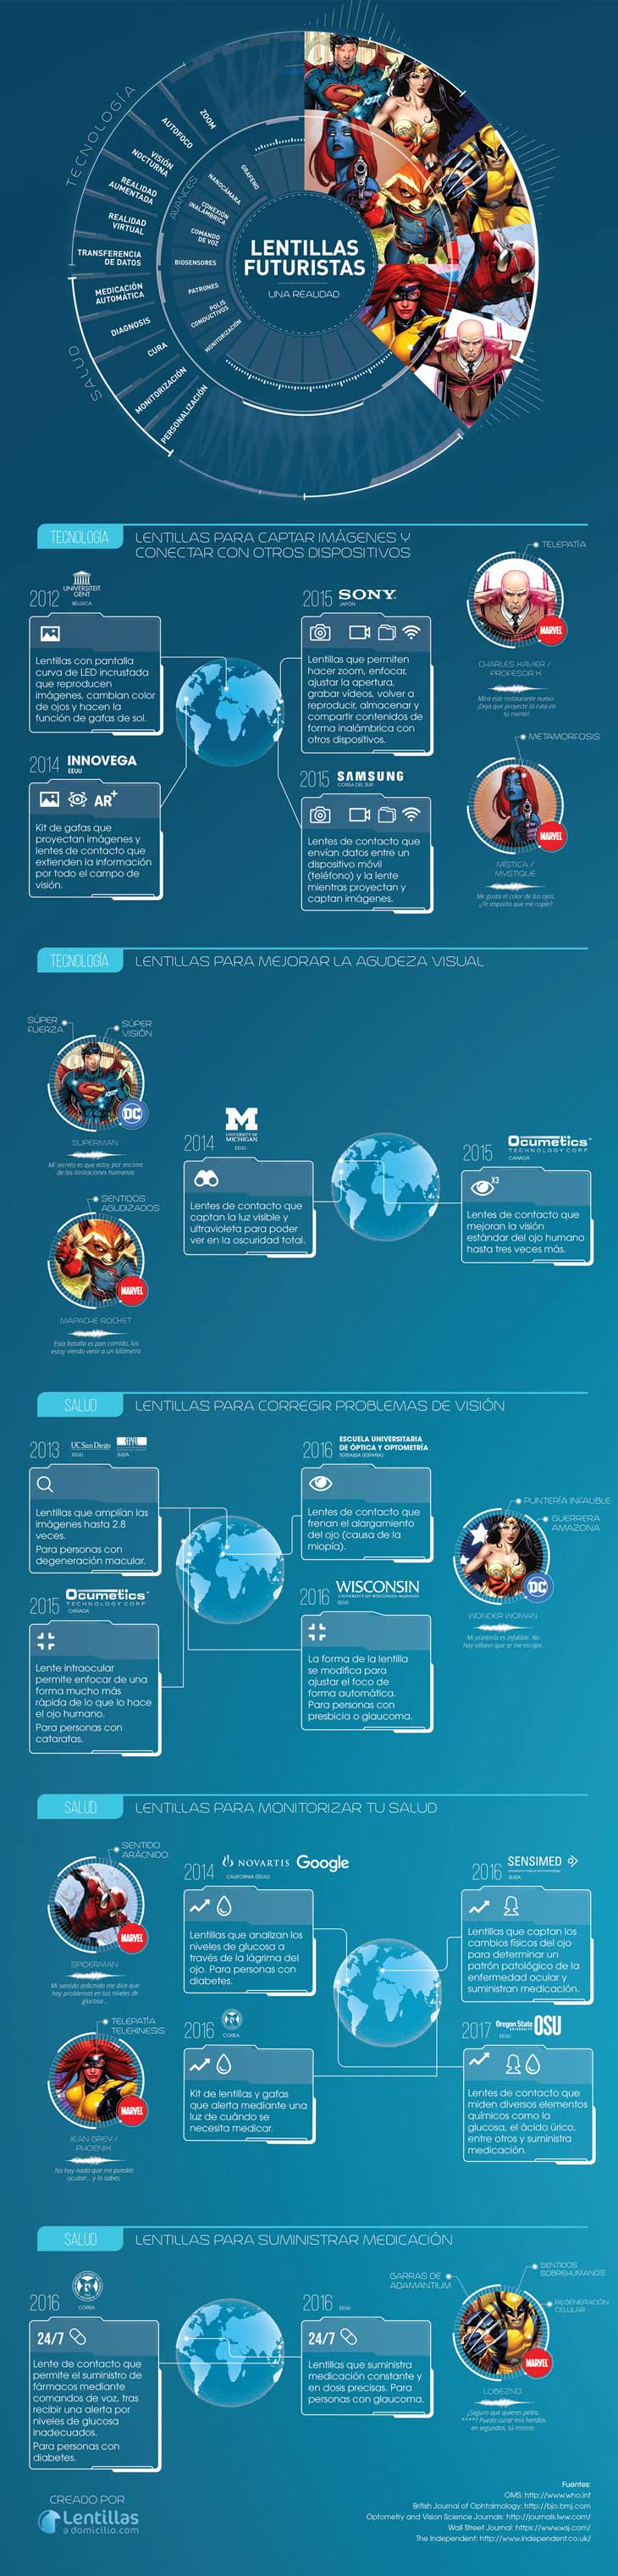 infografia_lentillas